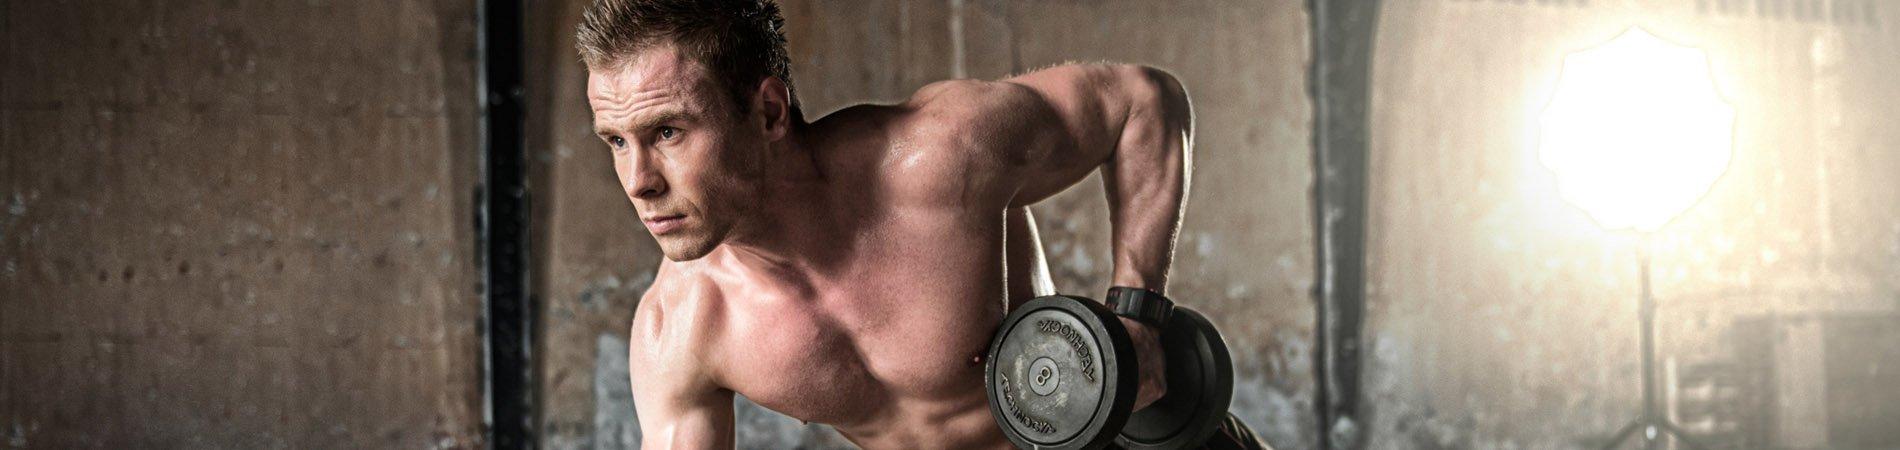 ▷▷ Tonificación muscular 【 Complementos alimenticios 】